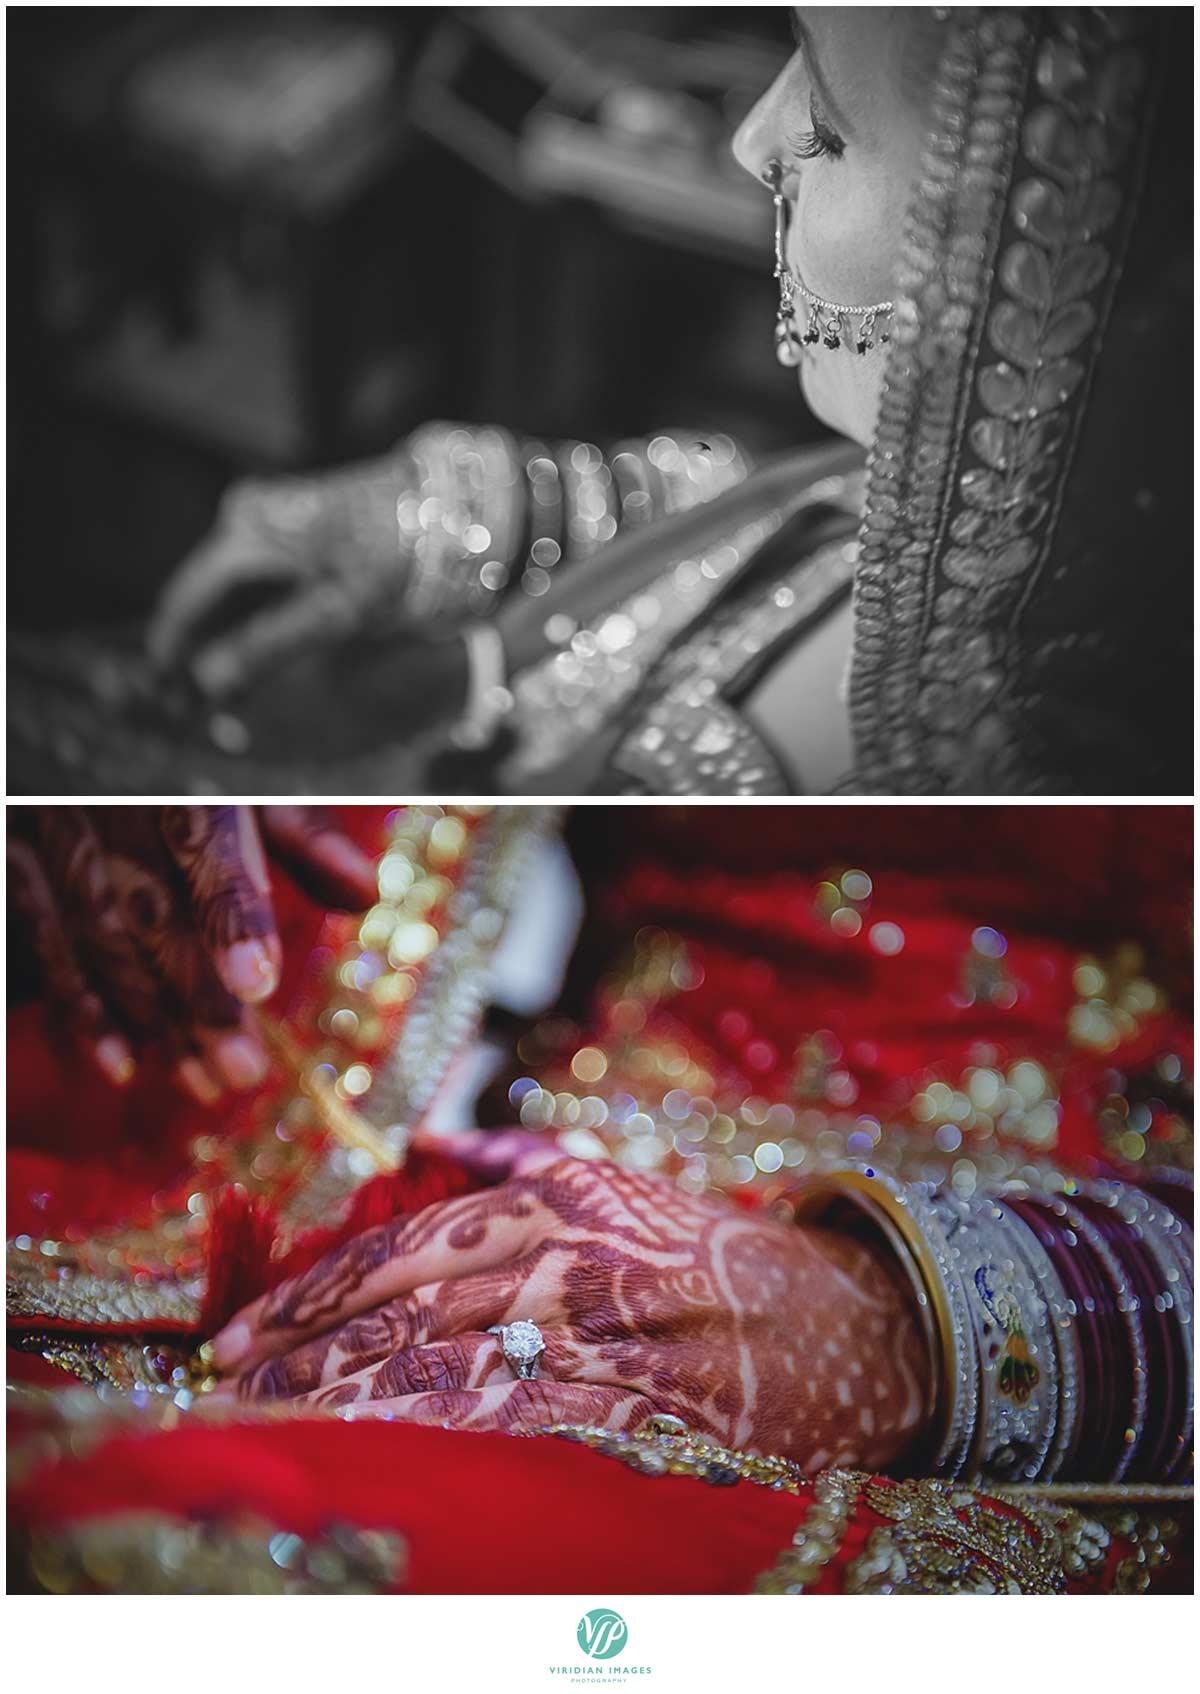 India_Chandigarh_Wedding_Viridian_Images_Photography_poto_4